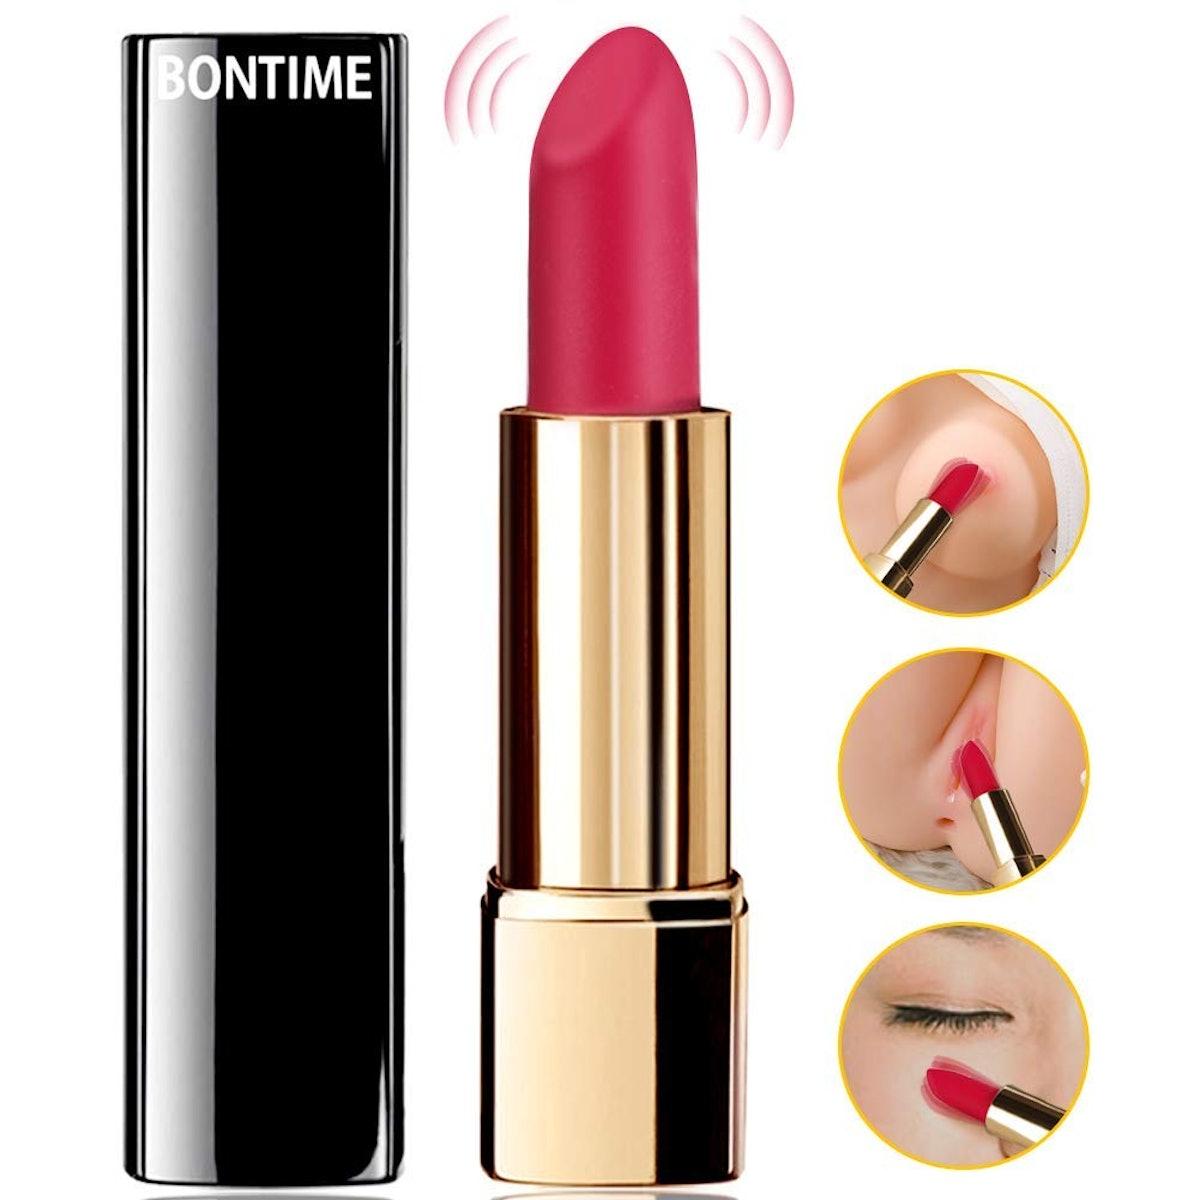 Bon'Time Lipstick Clitoral Vibrator